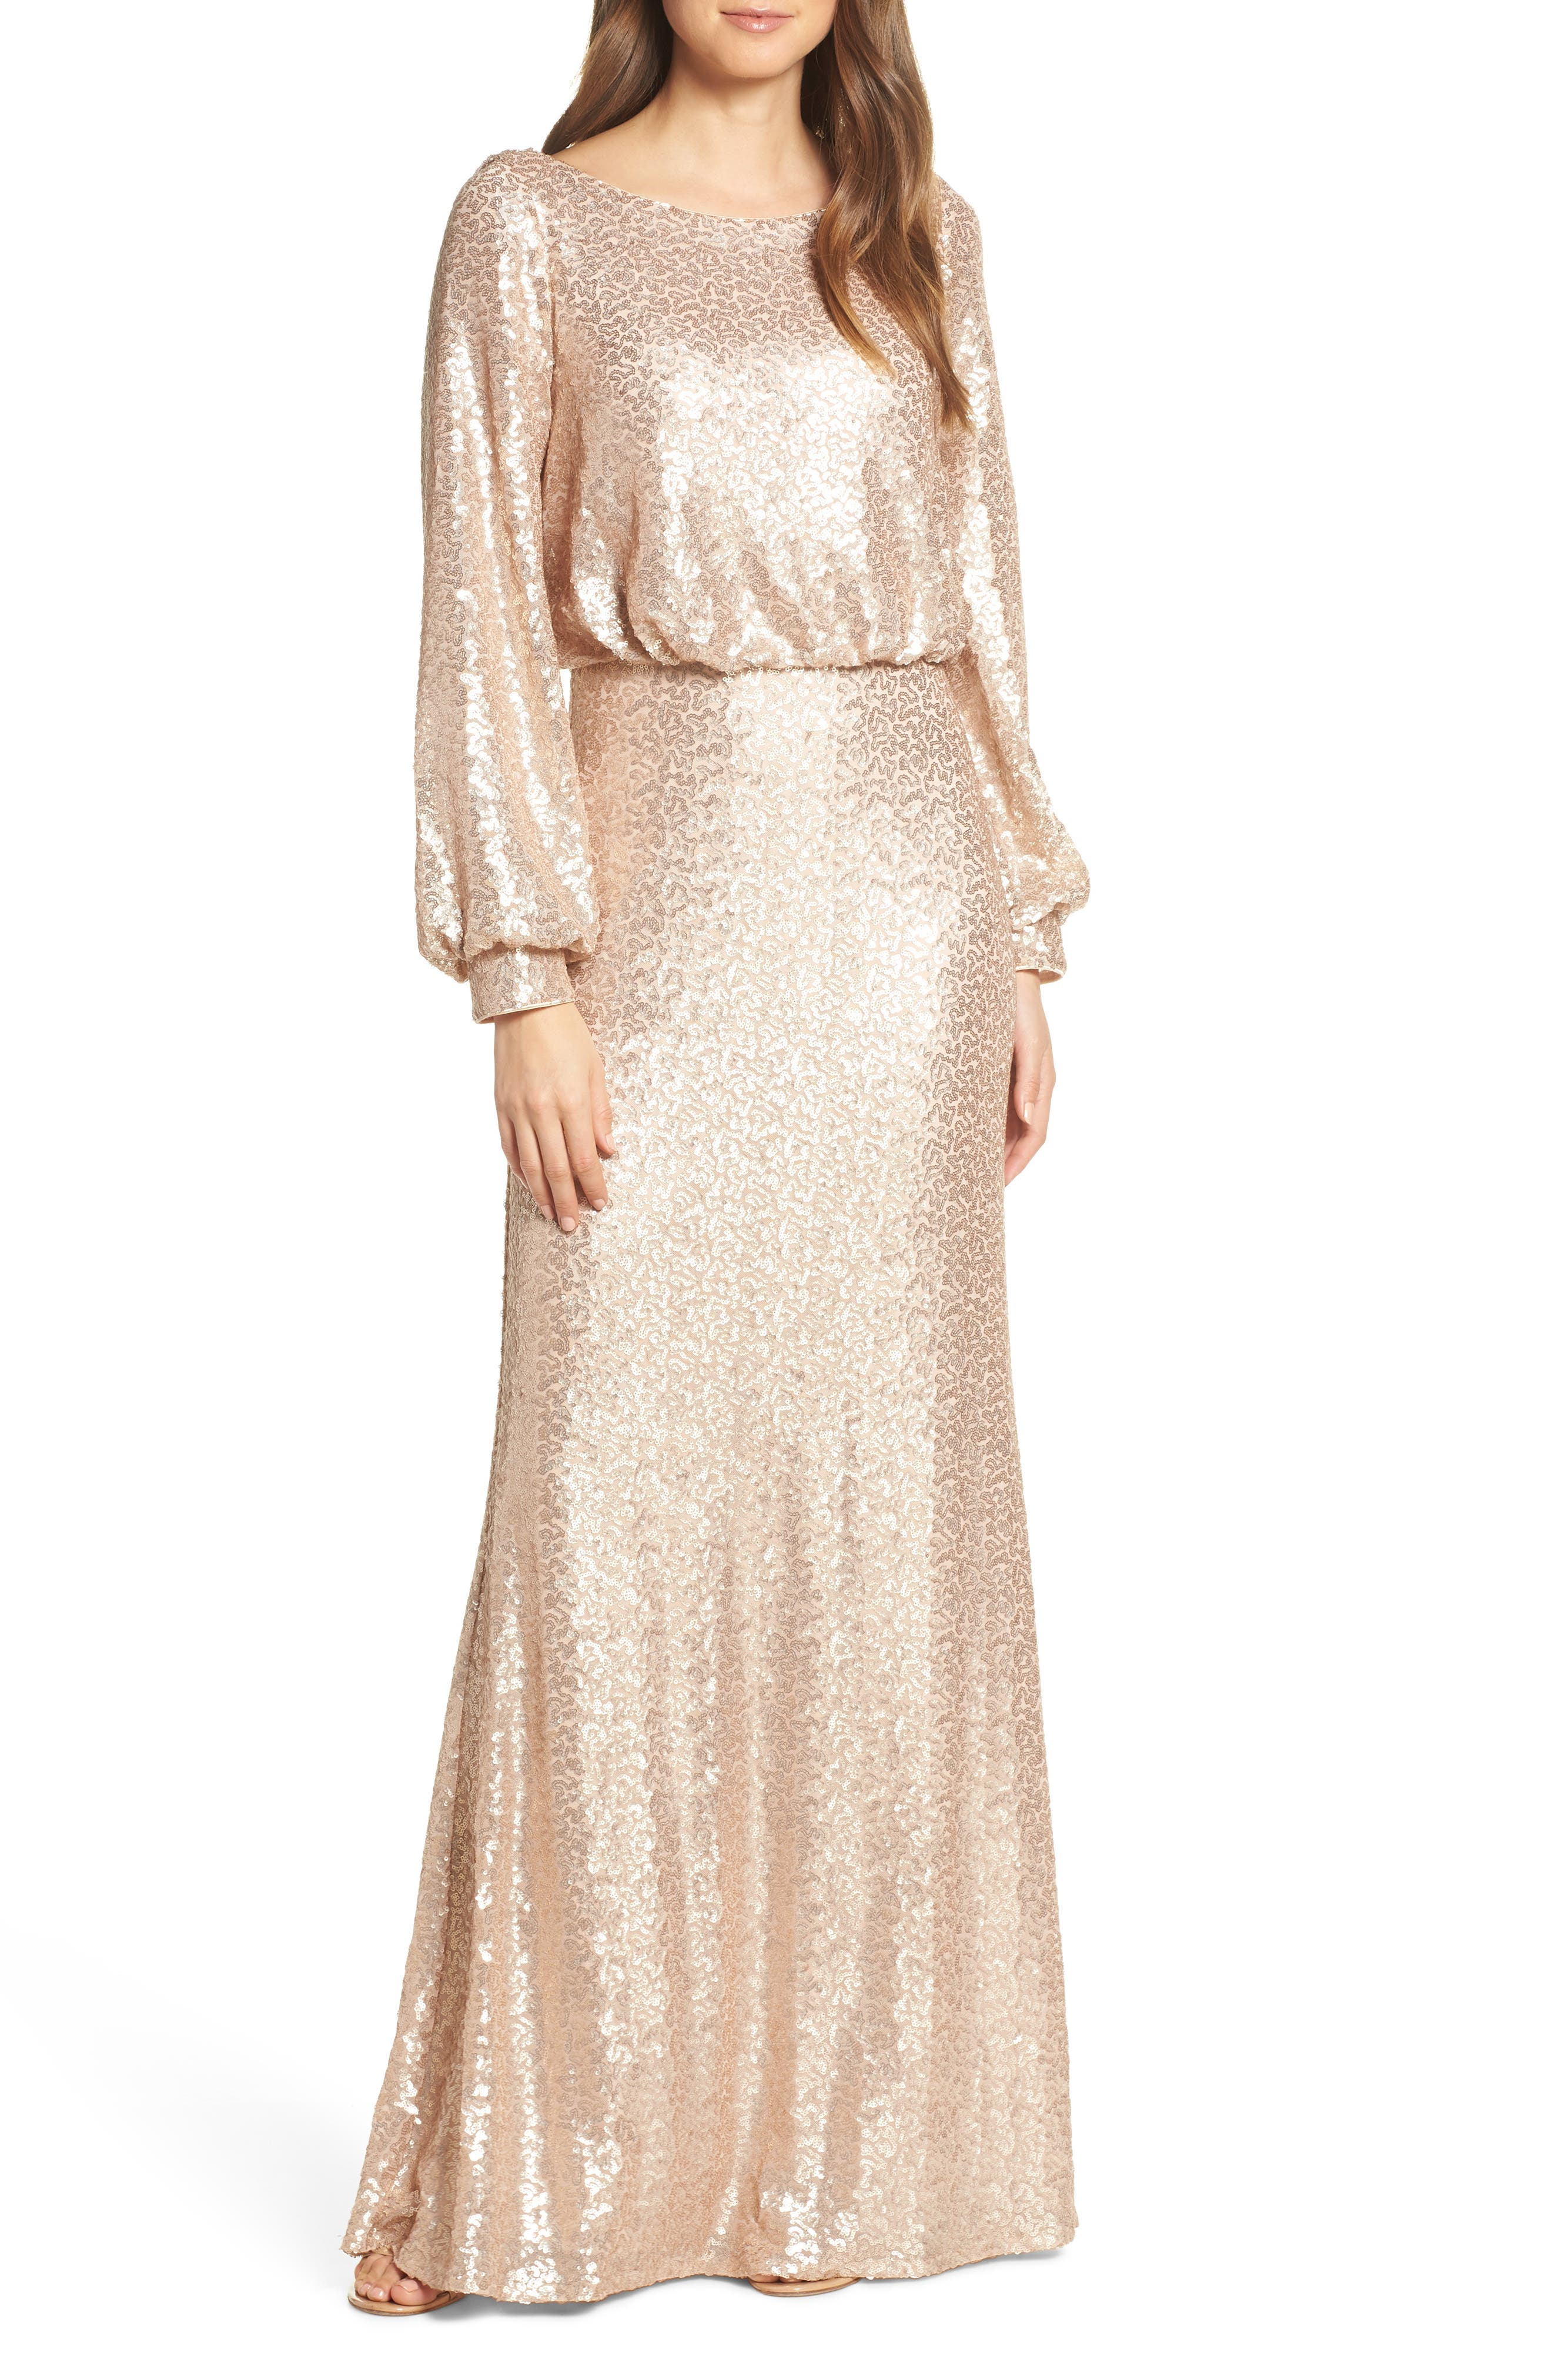 Tadashi Shoji Blouson Long Sleeve Sequin Evening Dress, Beige